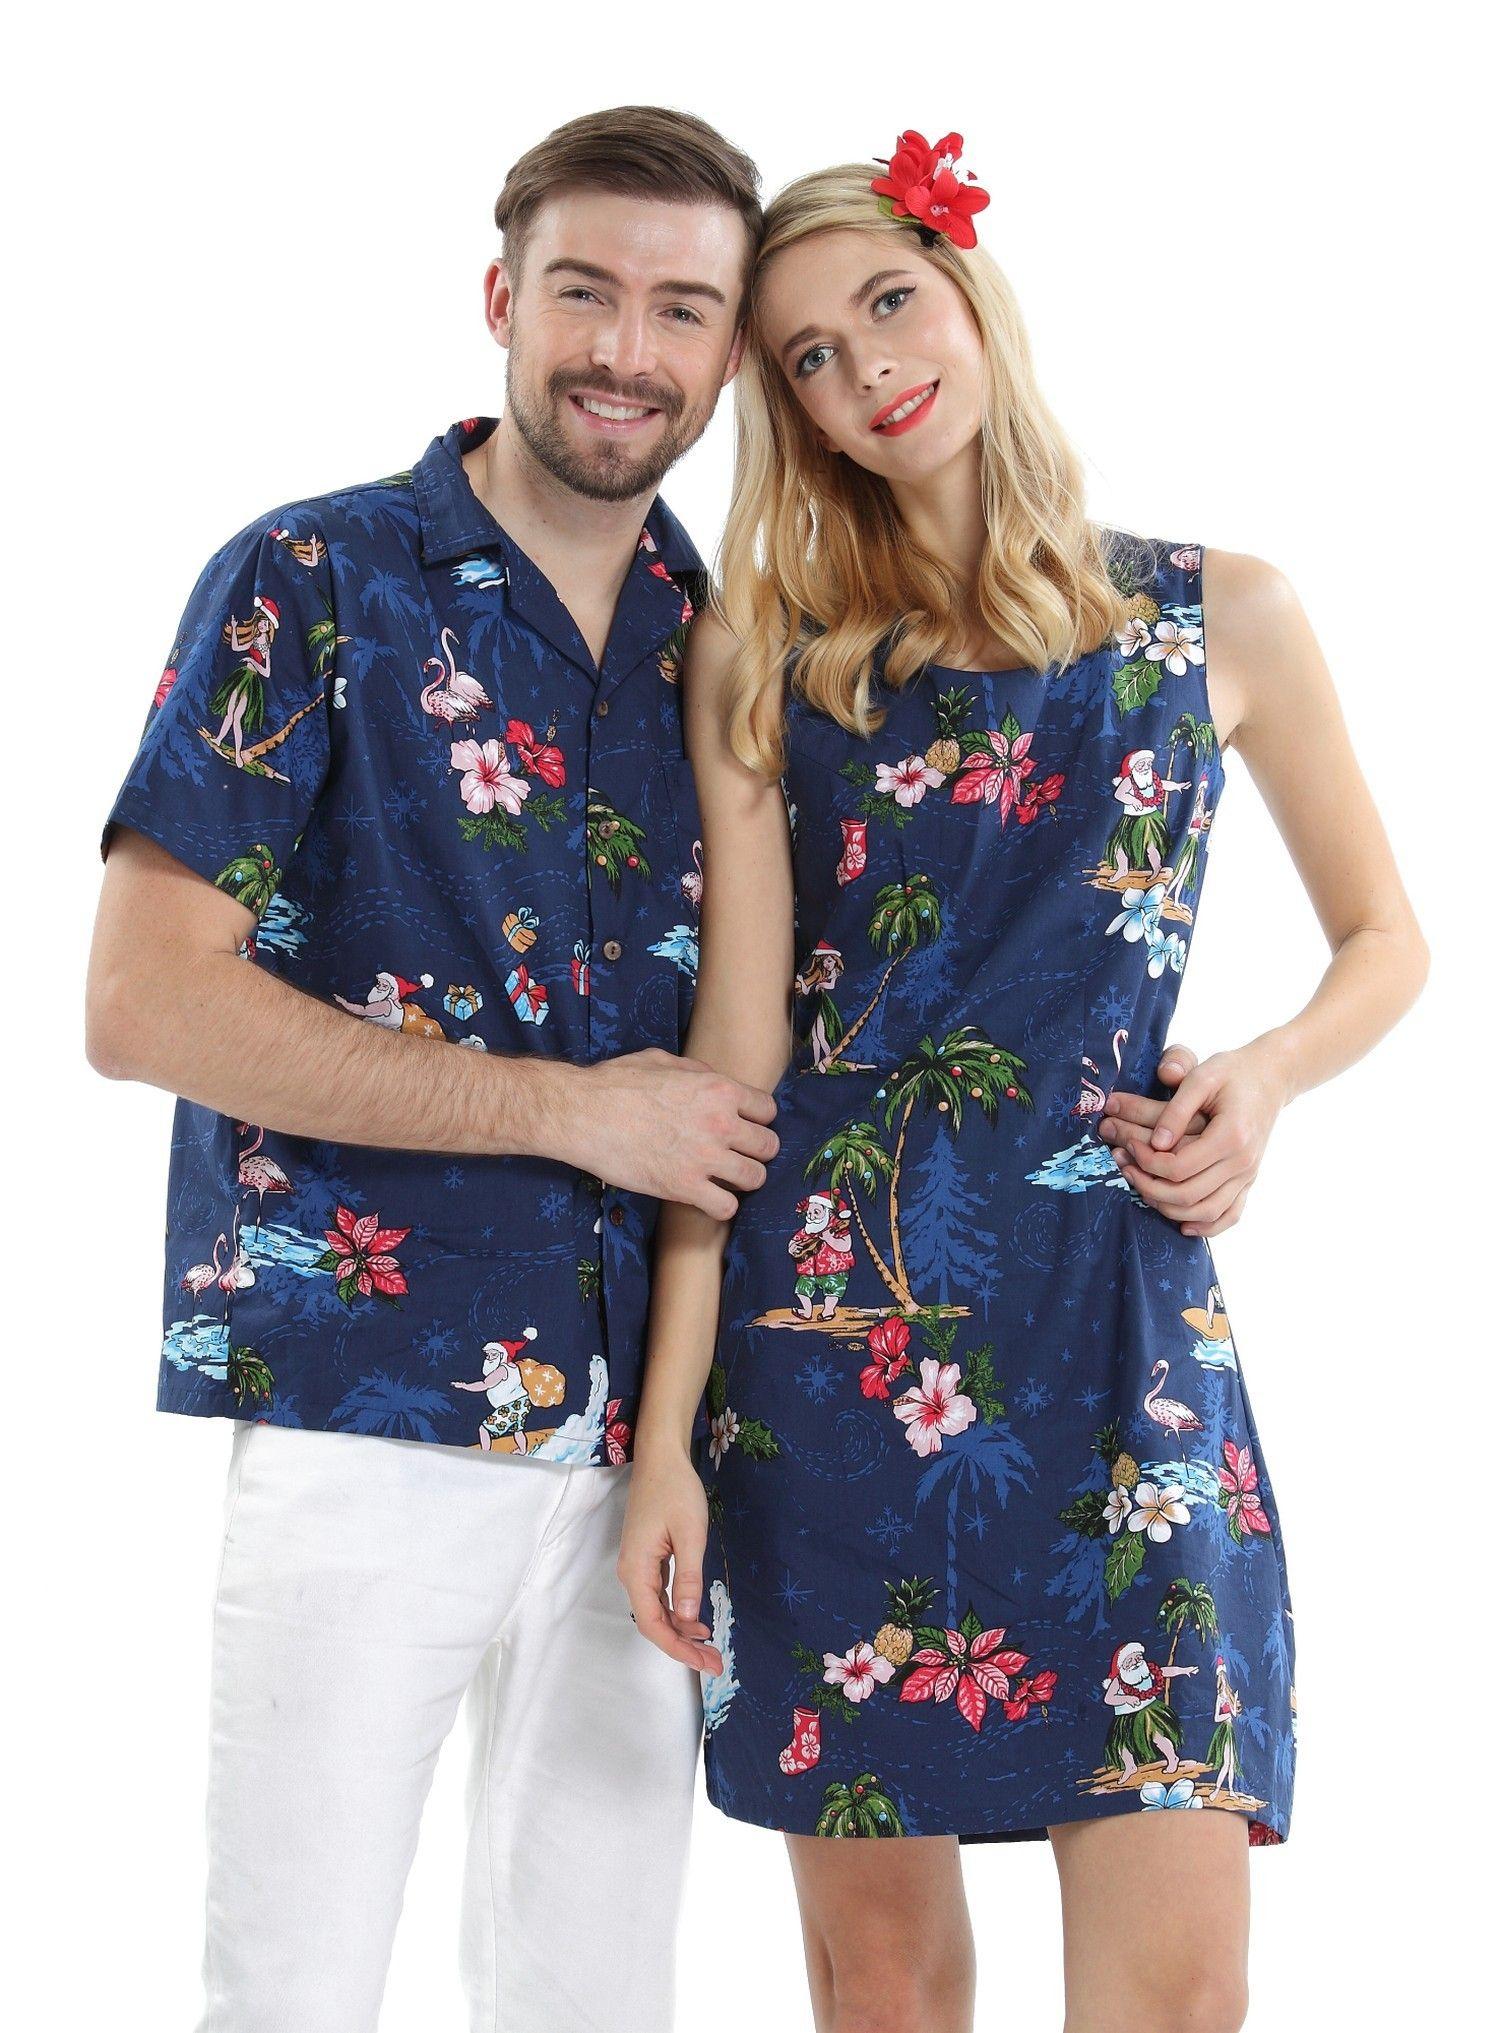 9b9f26c114 Couple Matching Men Aloha Shirt and Women Dresses in Santa Navy ...